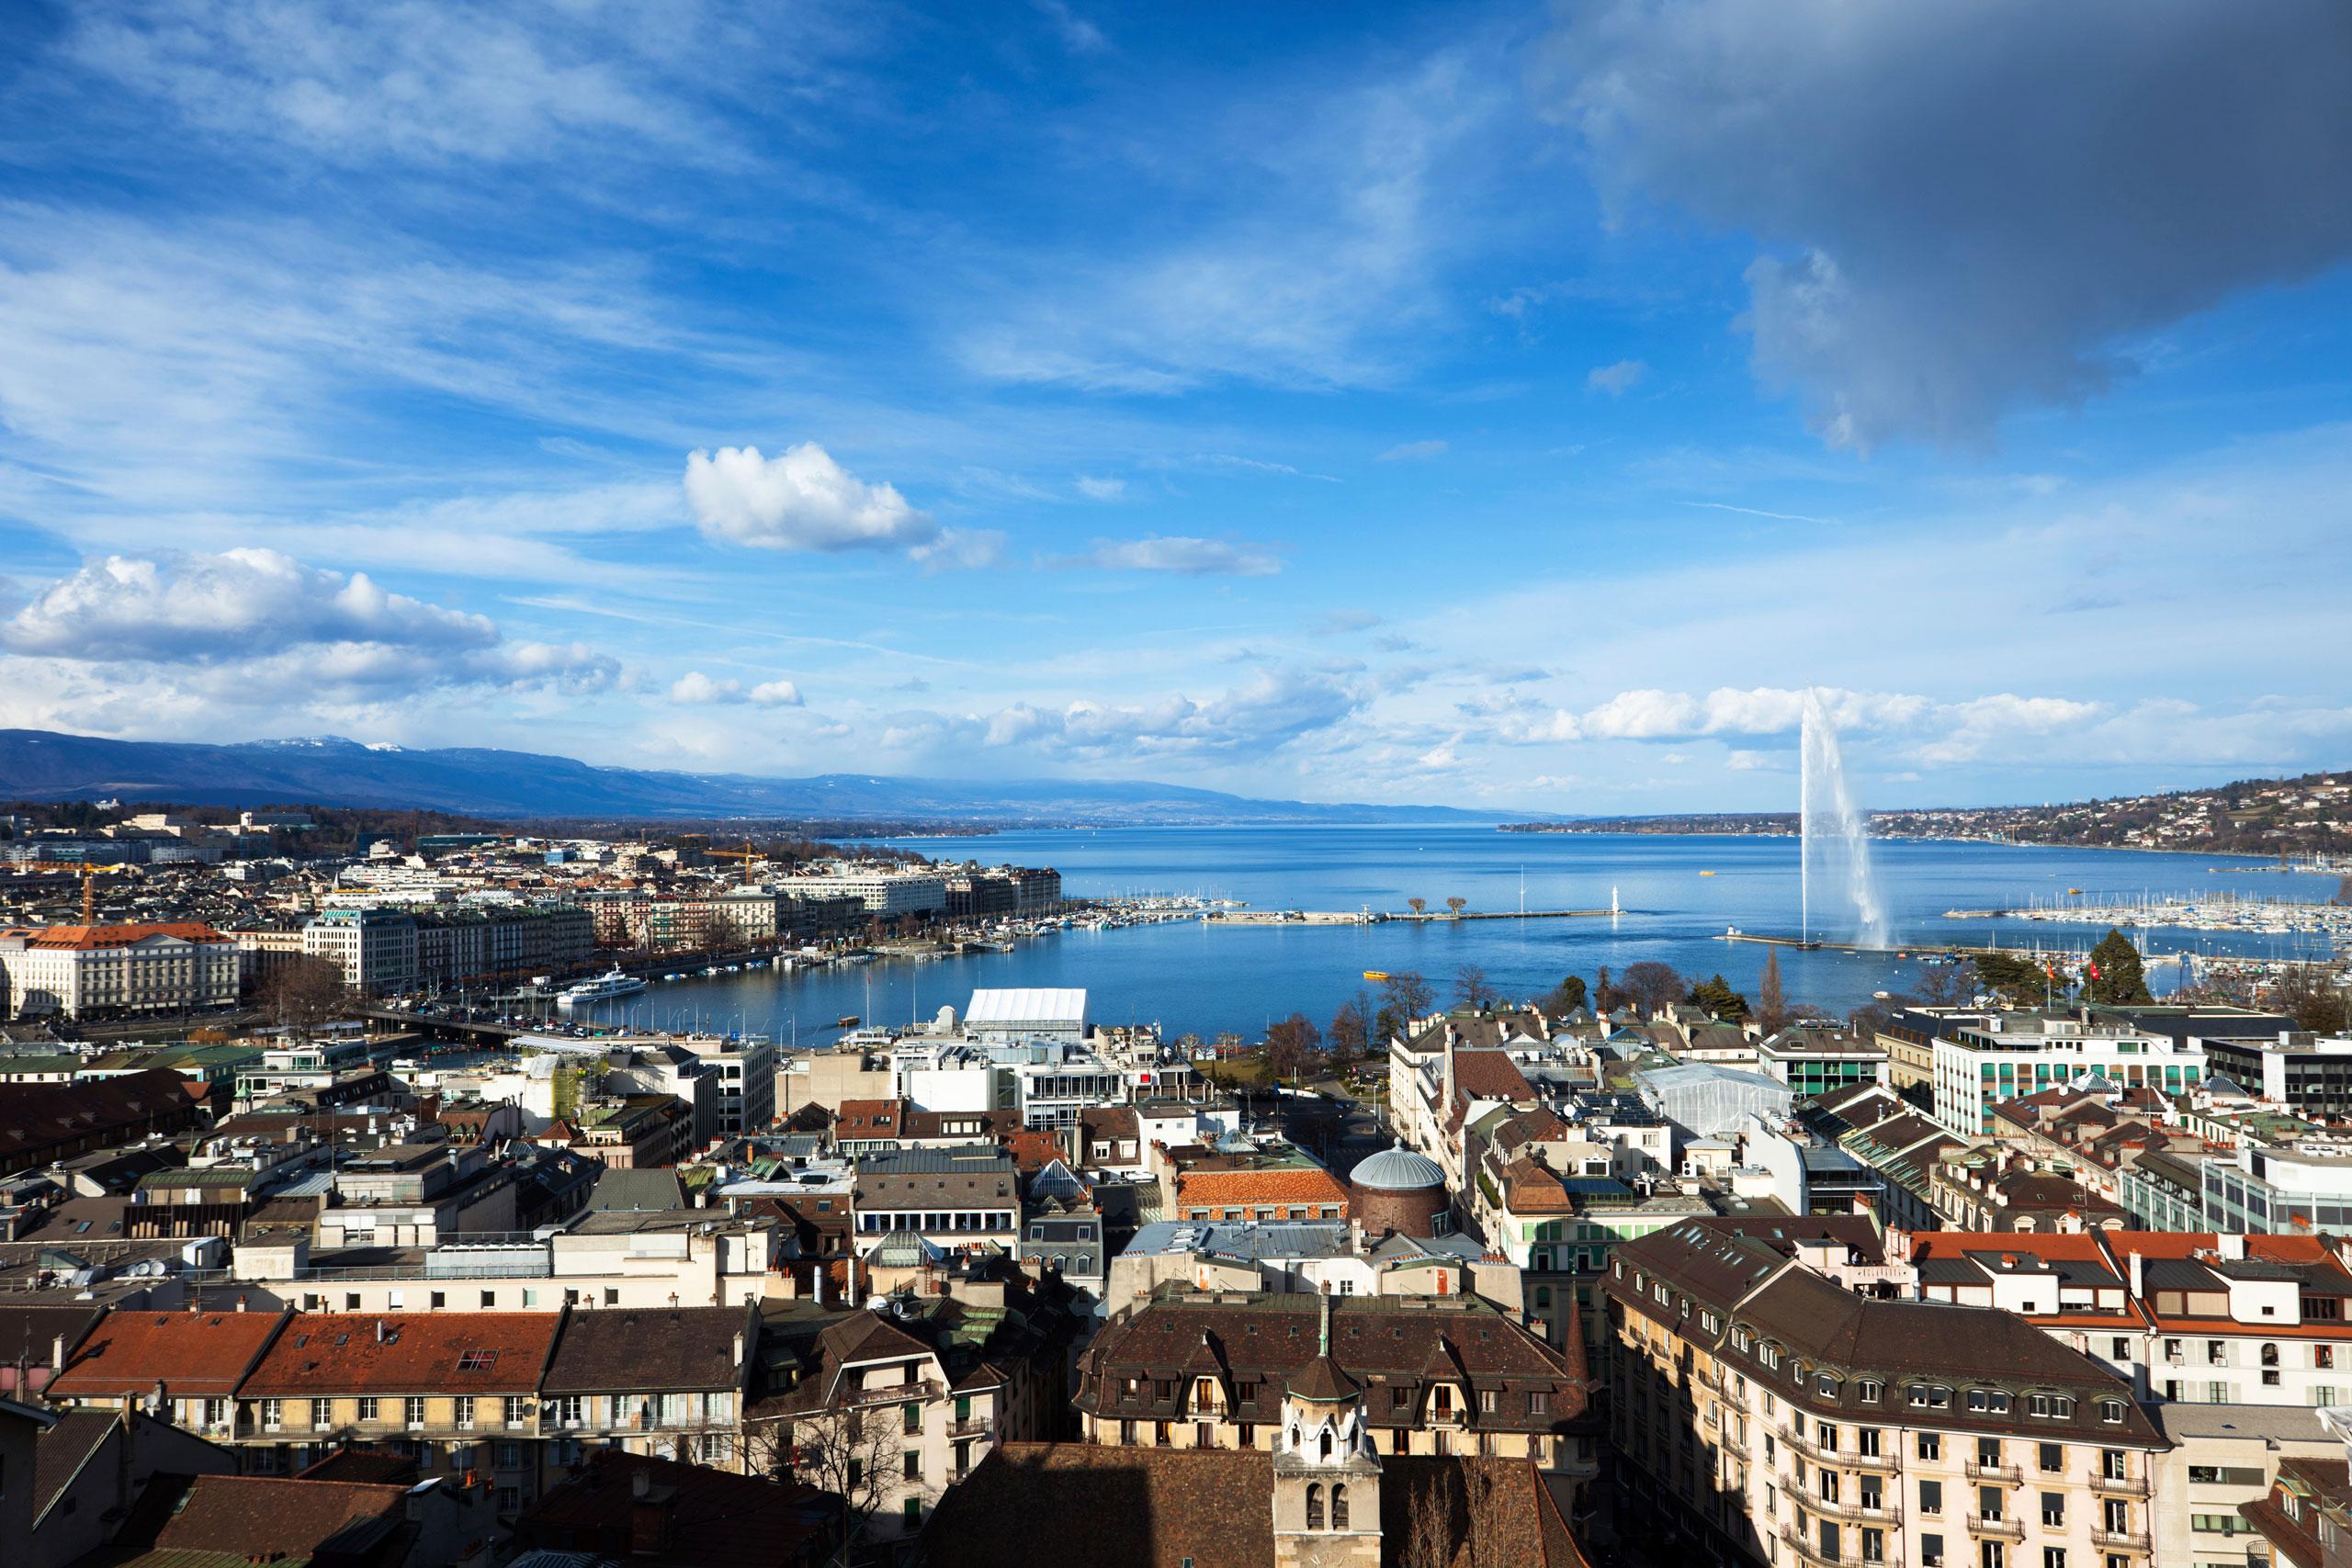 7. Geneva, Switzerland